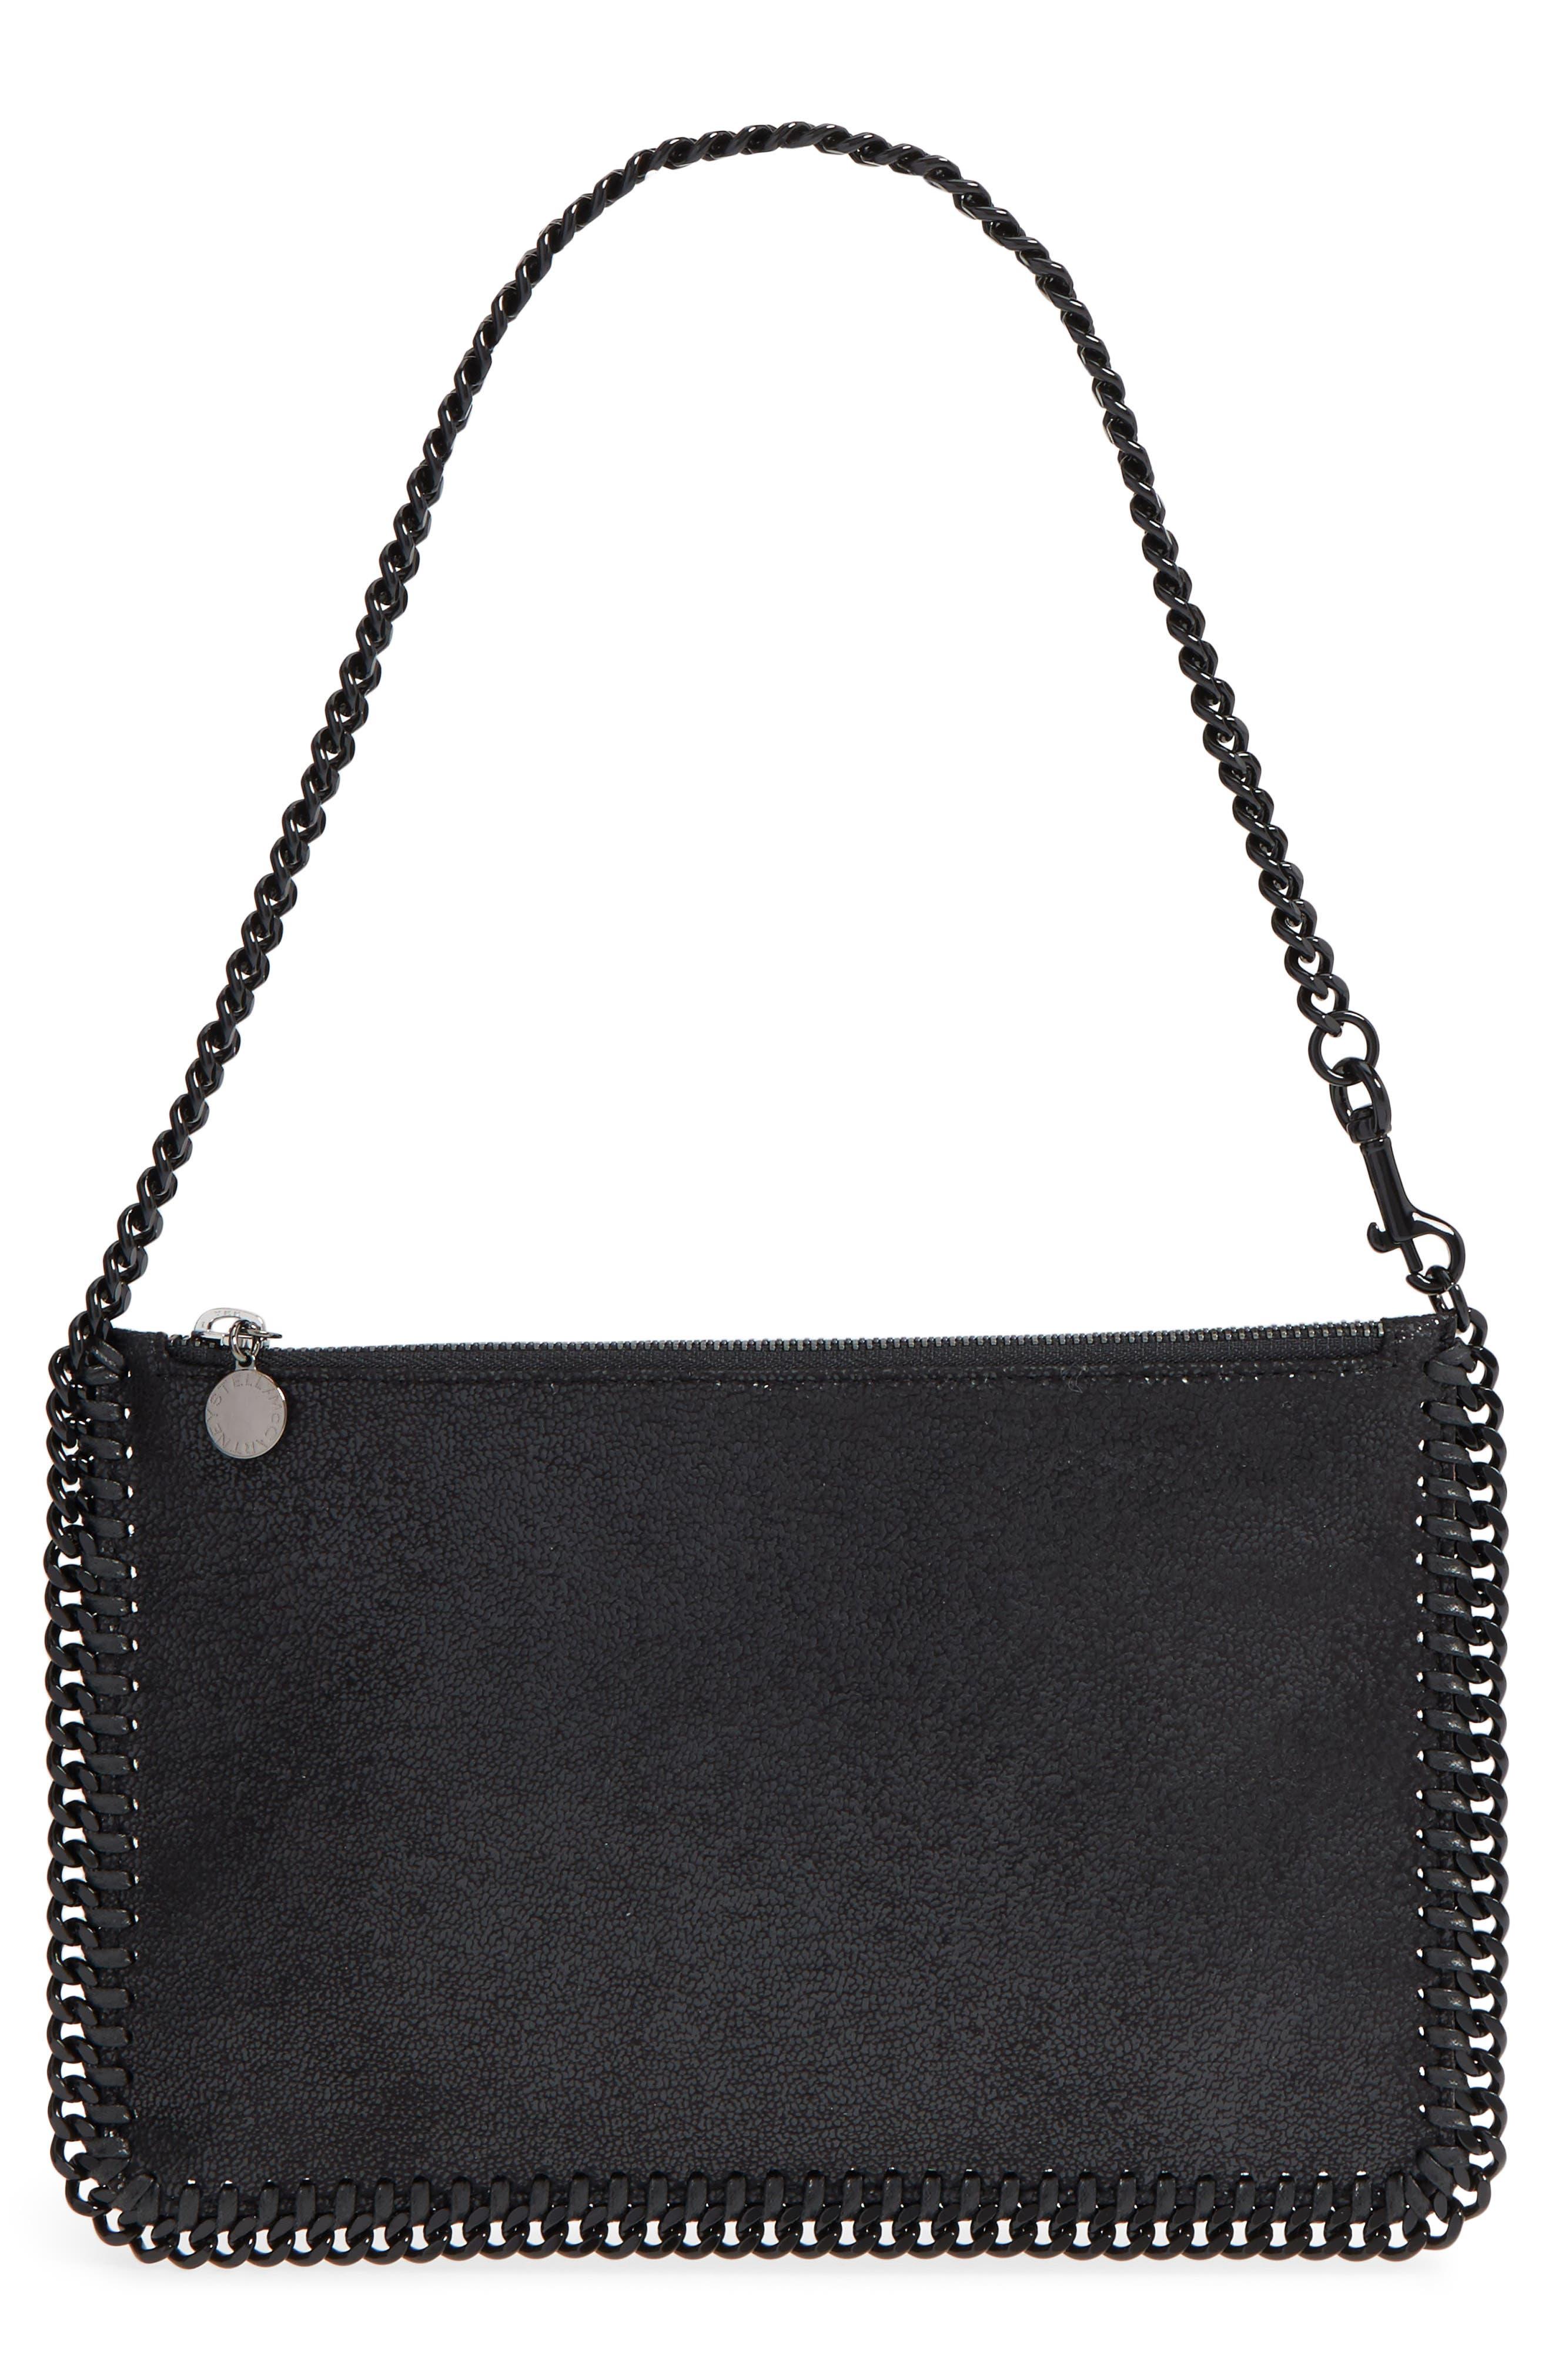 STELLA MCCARTNEY, Falabella Shaggy Deer Faux Leather Handbag, Main thumbnail 1, color, 001